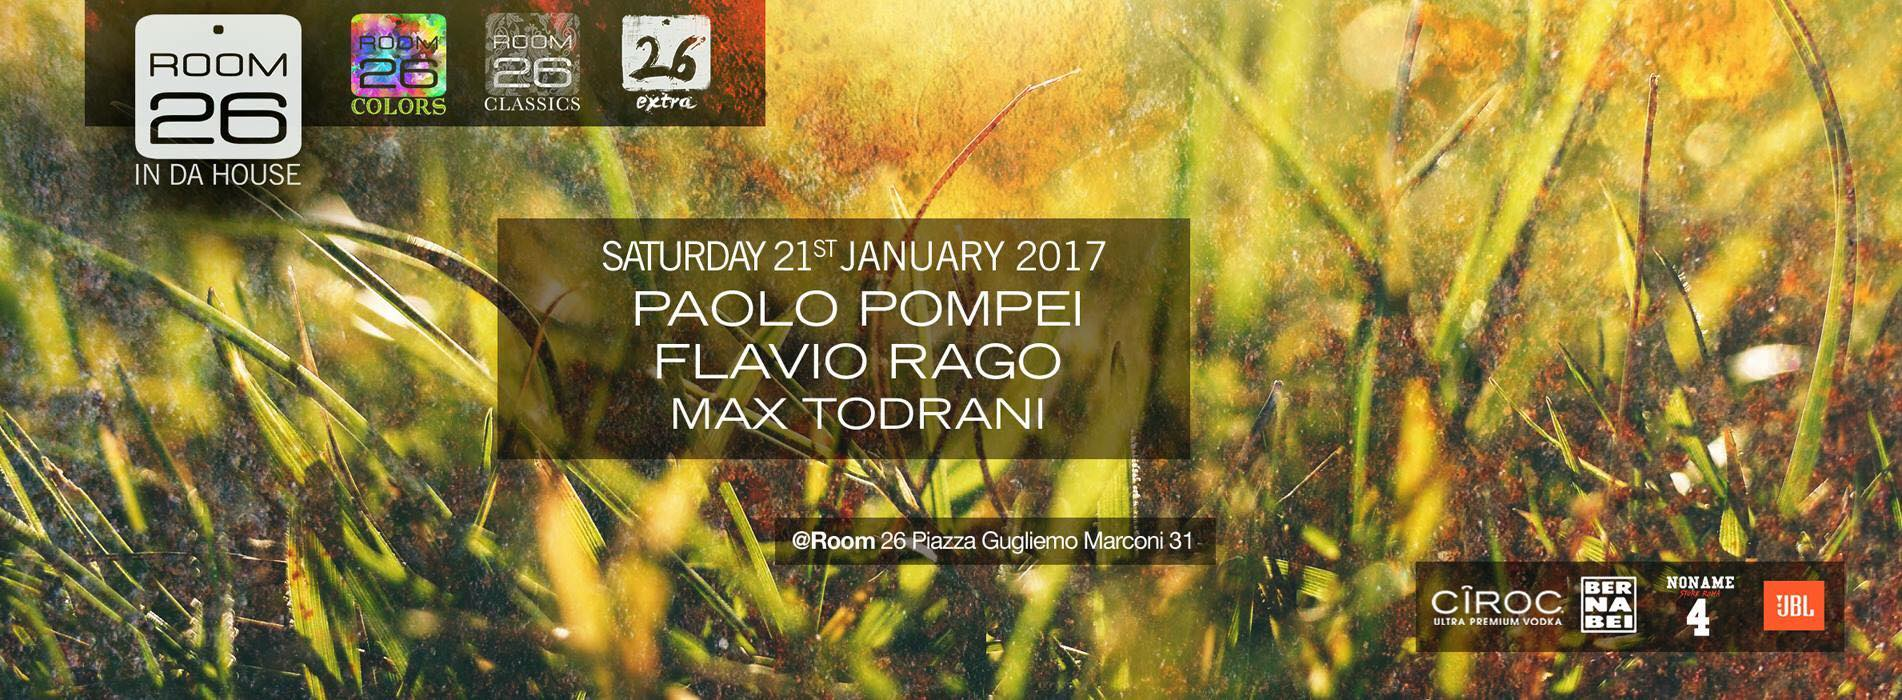 Room 26 sabato 21 gennaio 2017 house e dance lista + privè